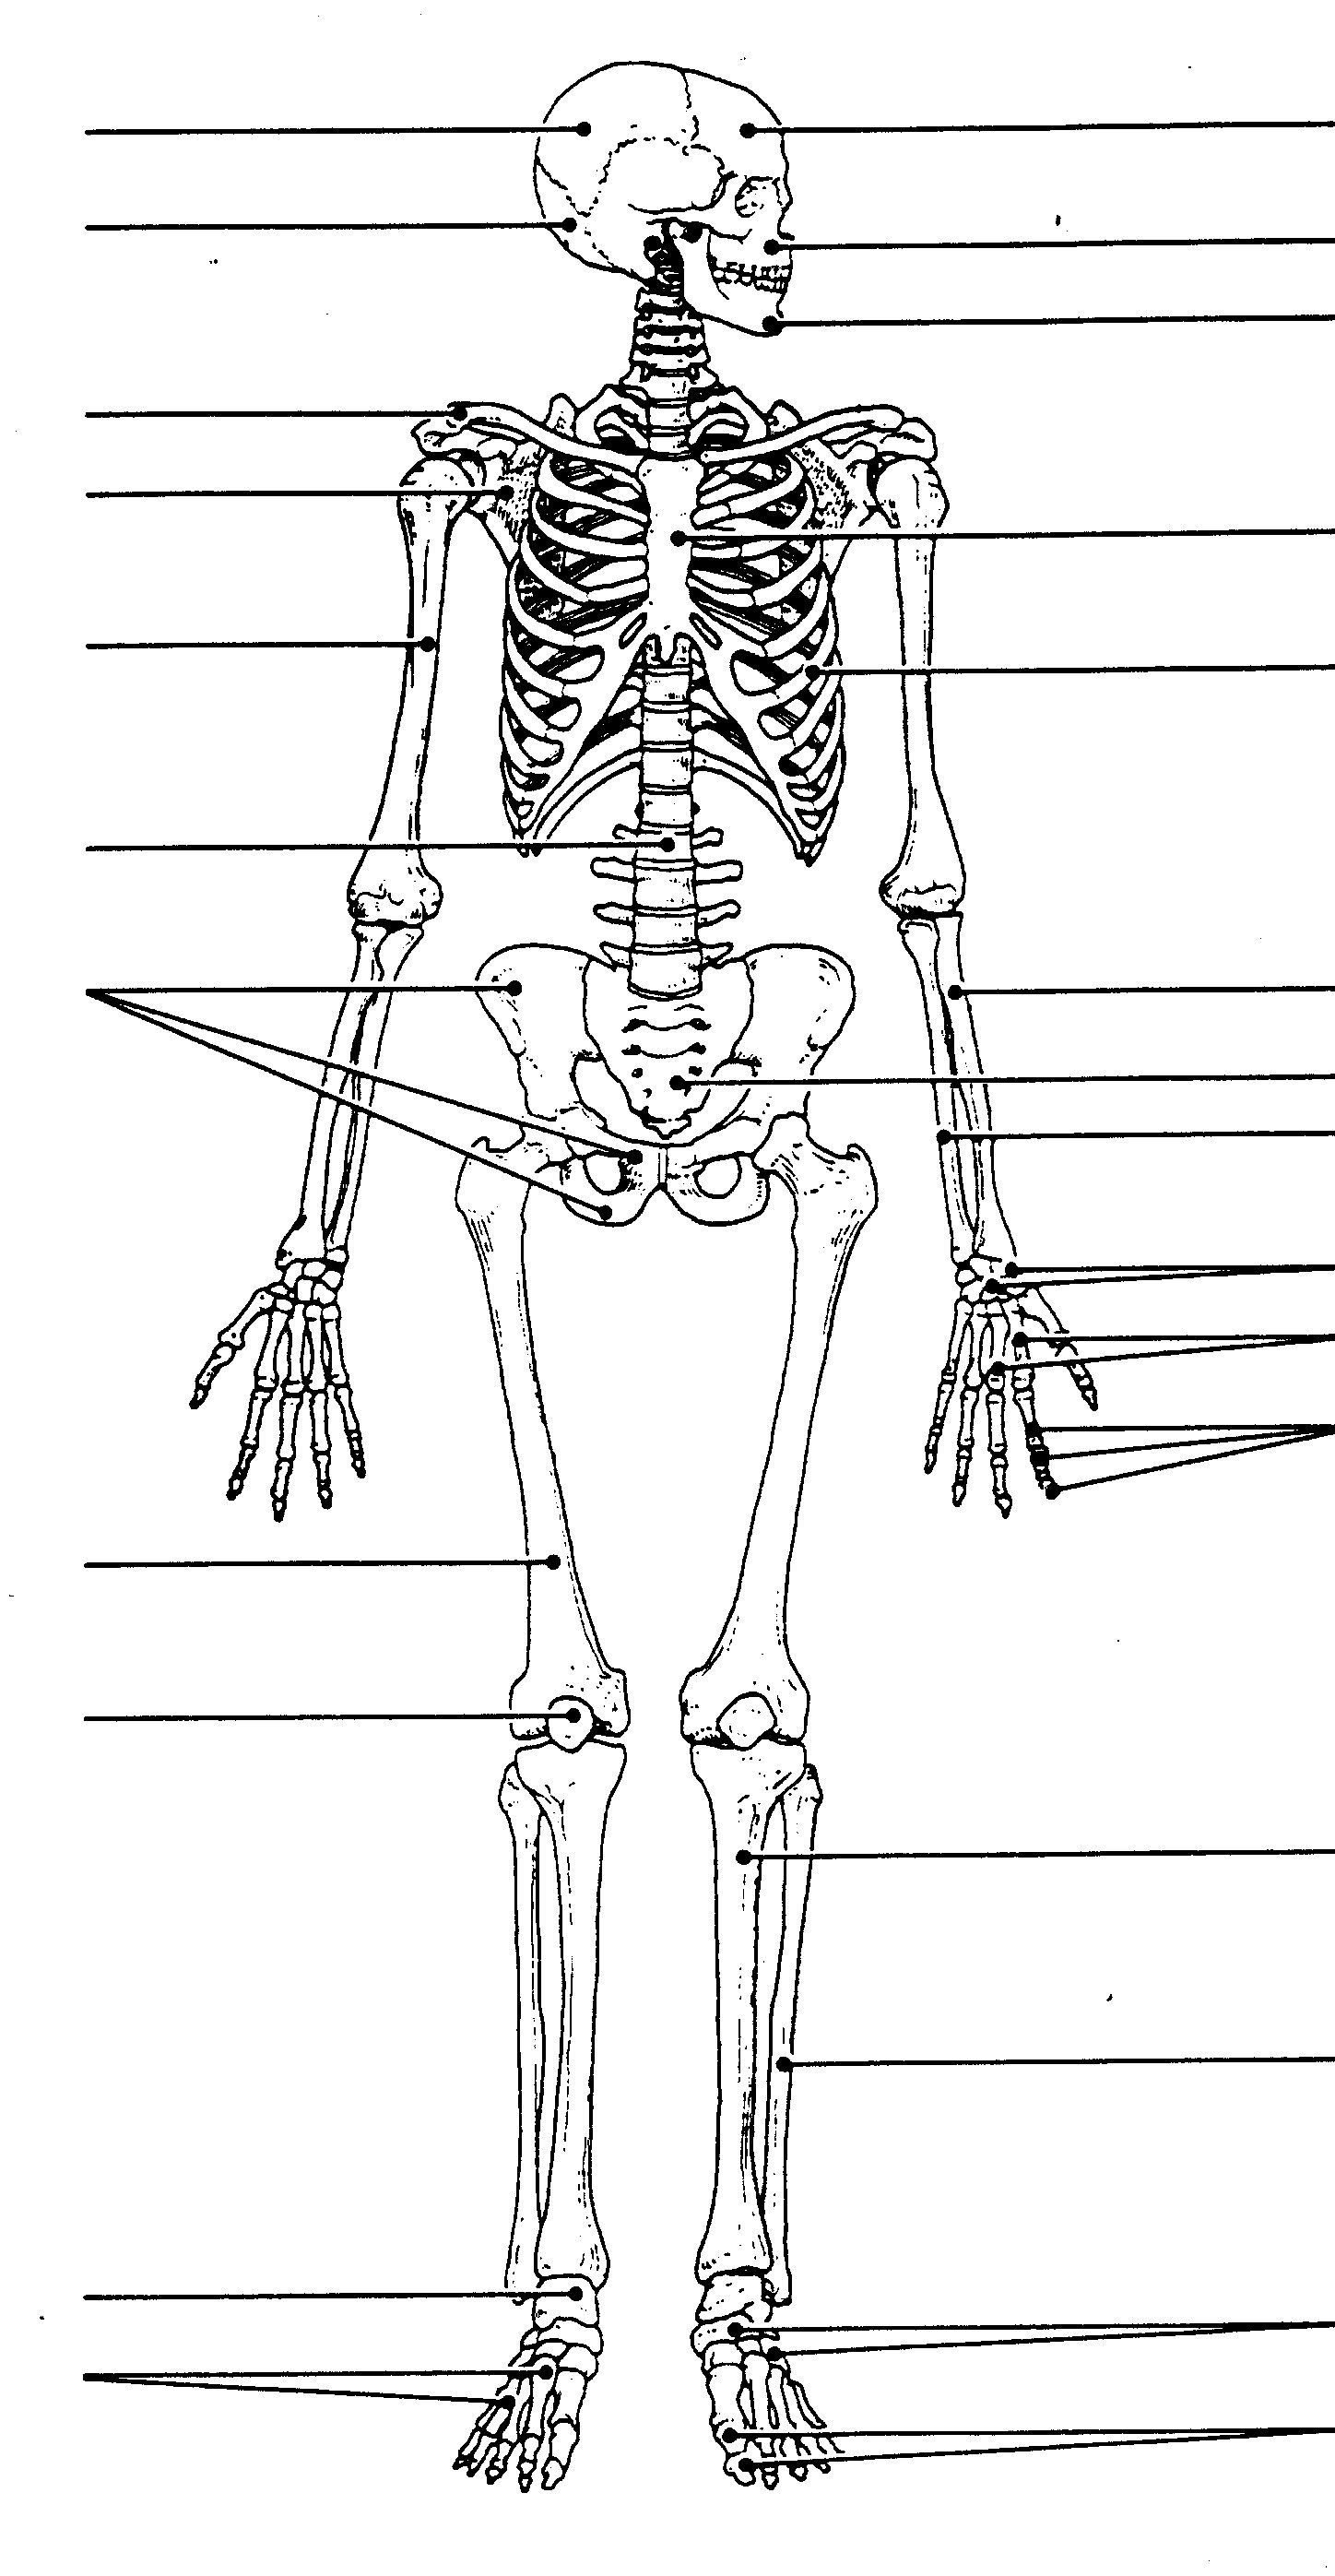 hight resolution of human skeleton diagram unlabeled human skeleton diagram unlabeled blank human skeleton diagram unlabeled human skeleton